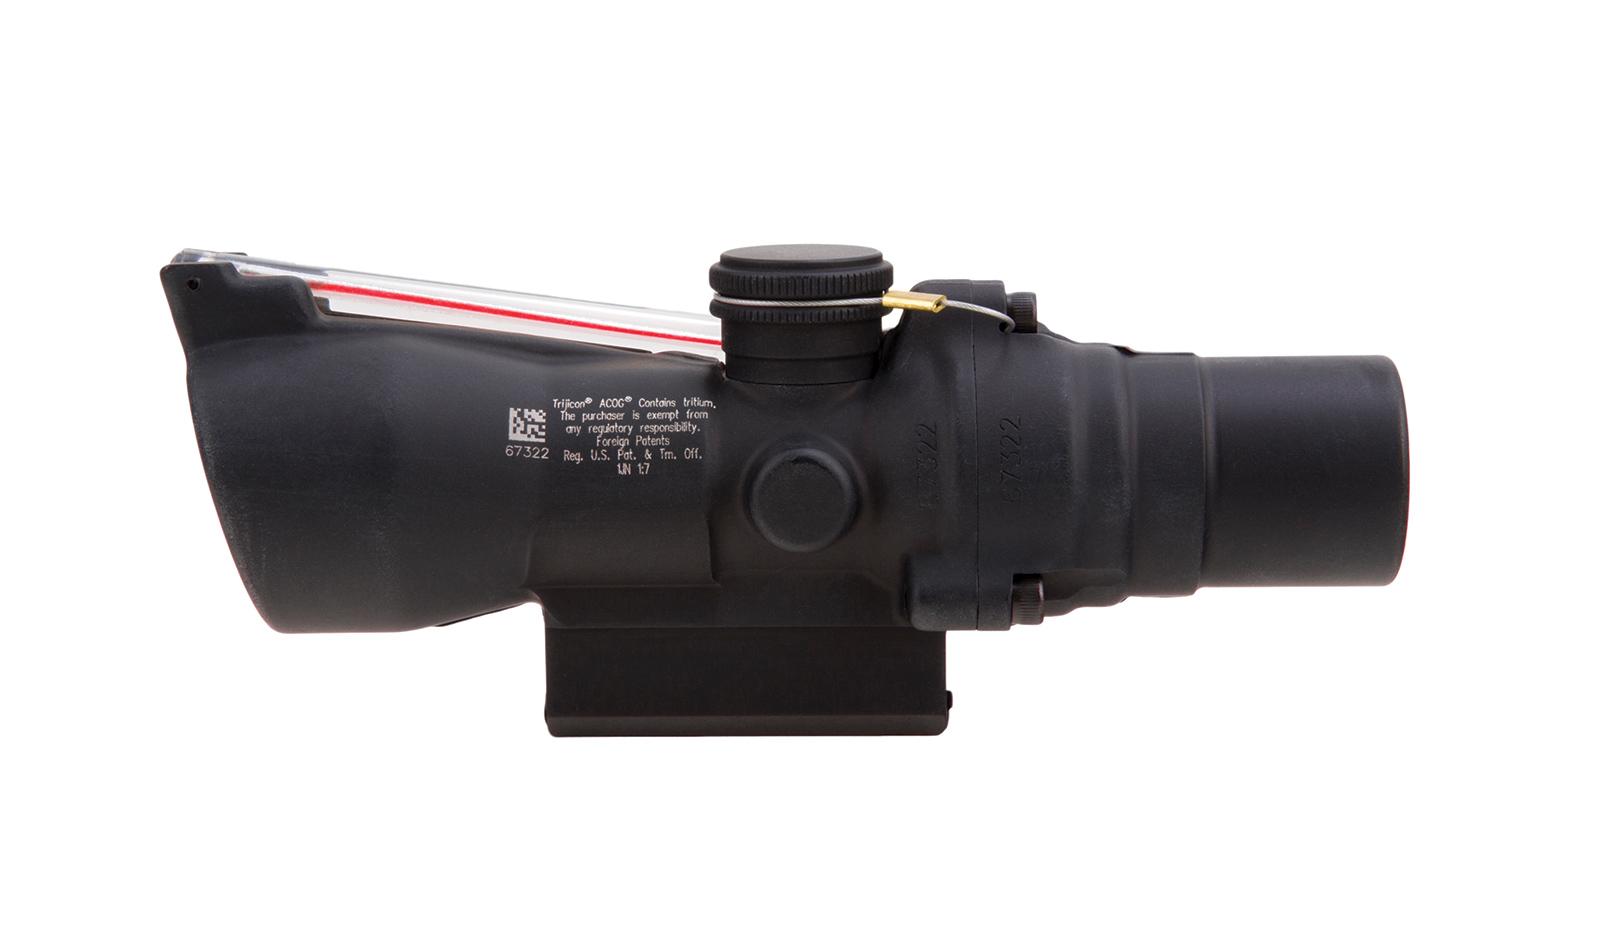 TA47-C-400150 angle 2